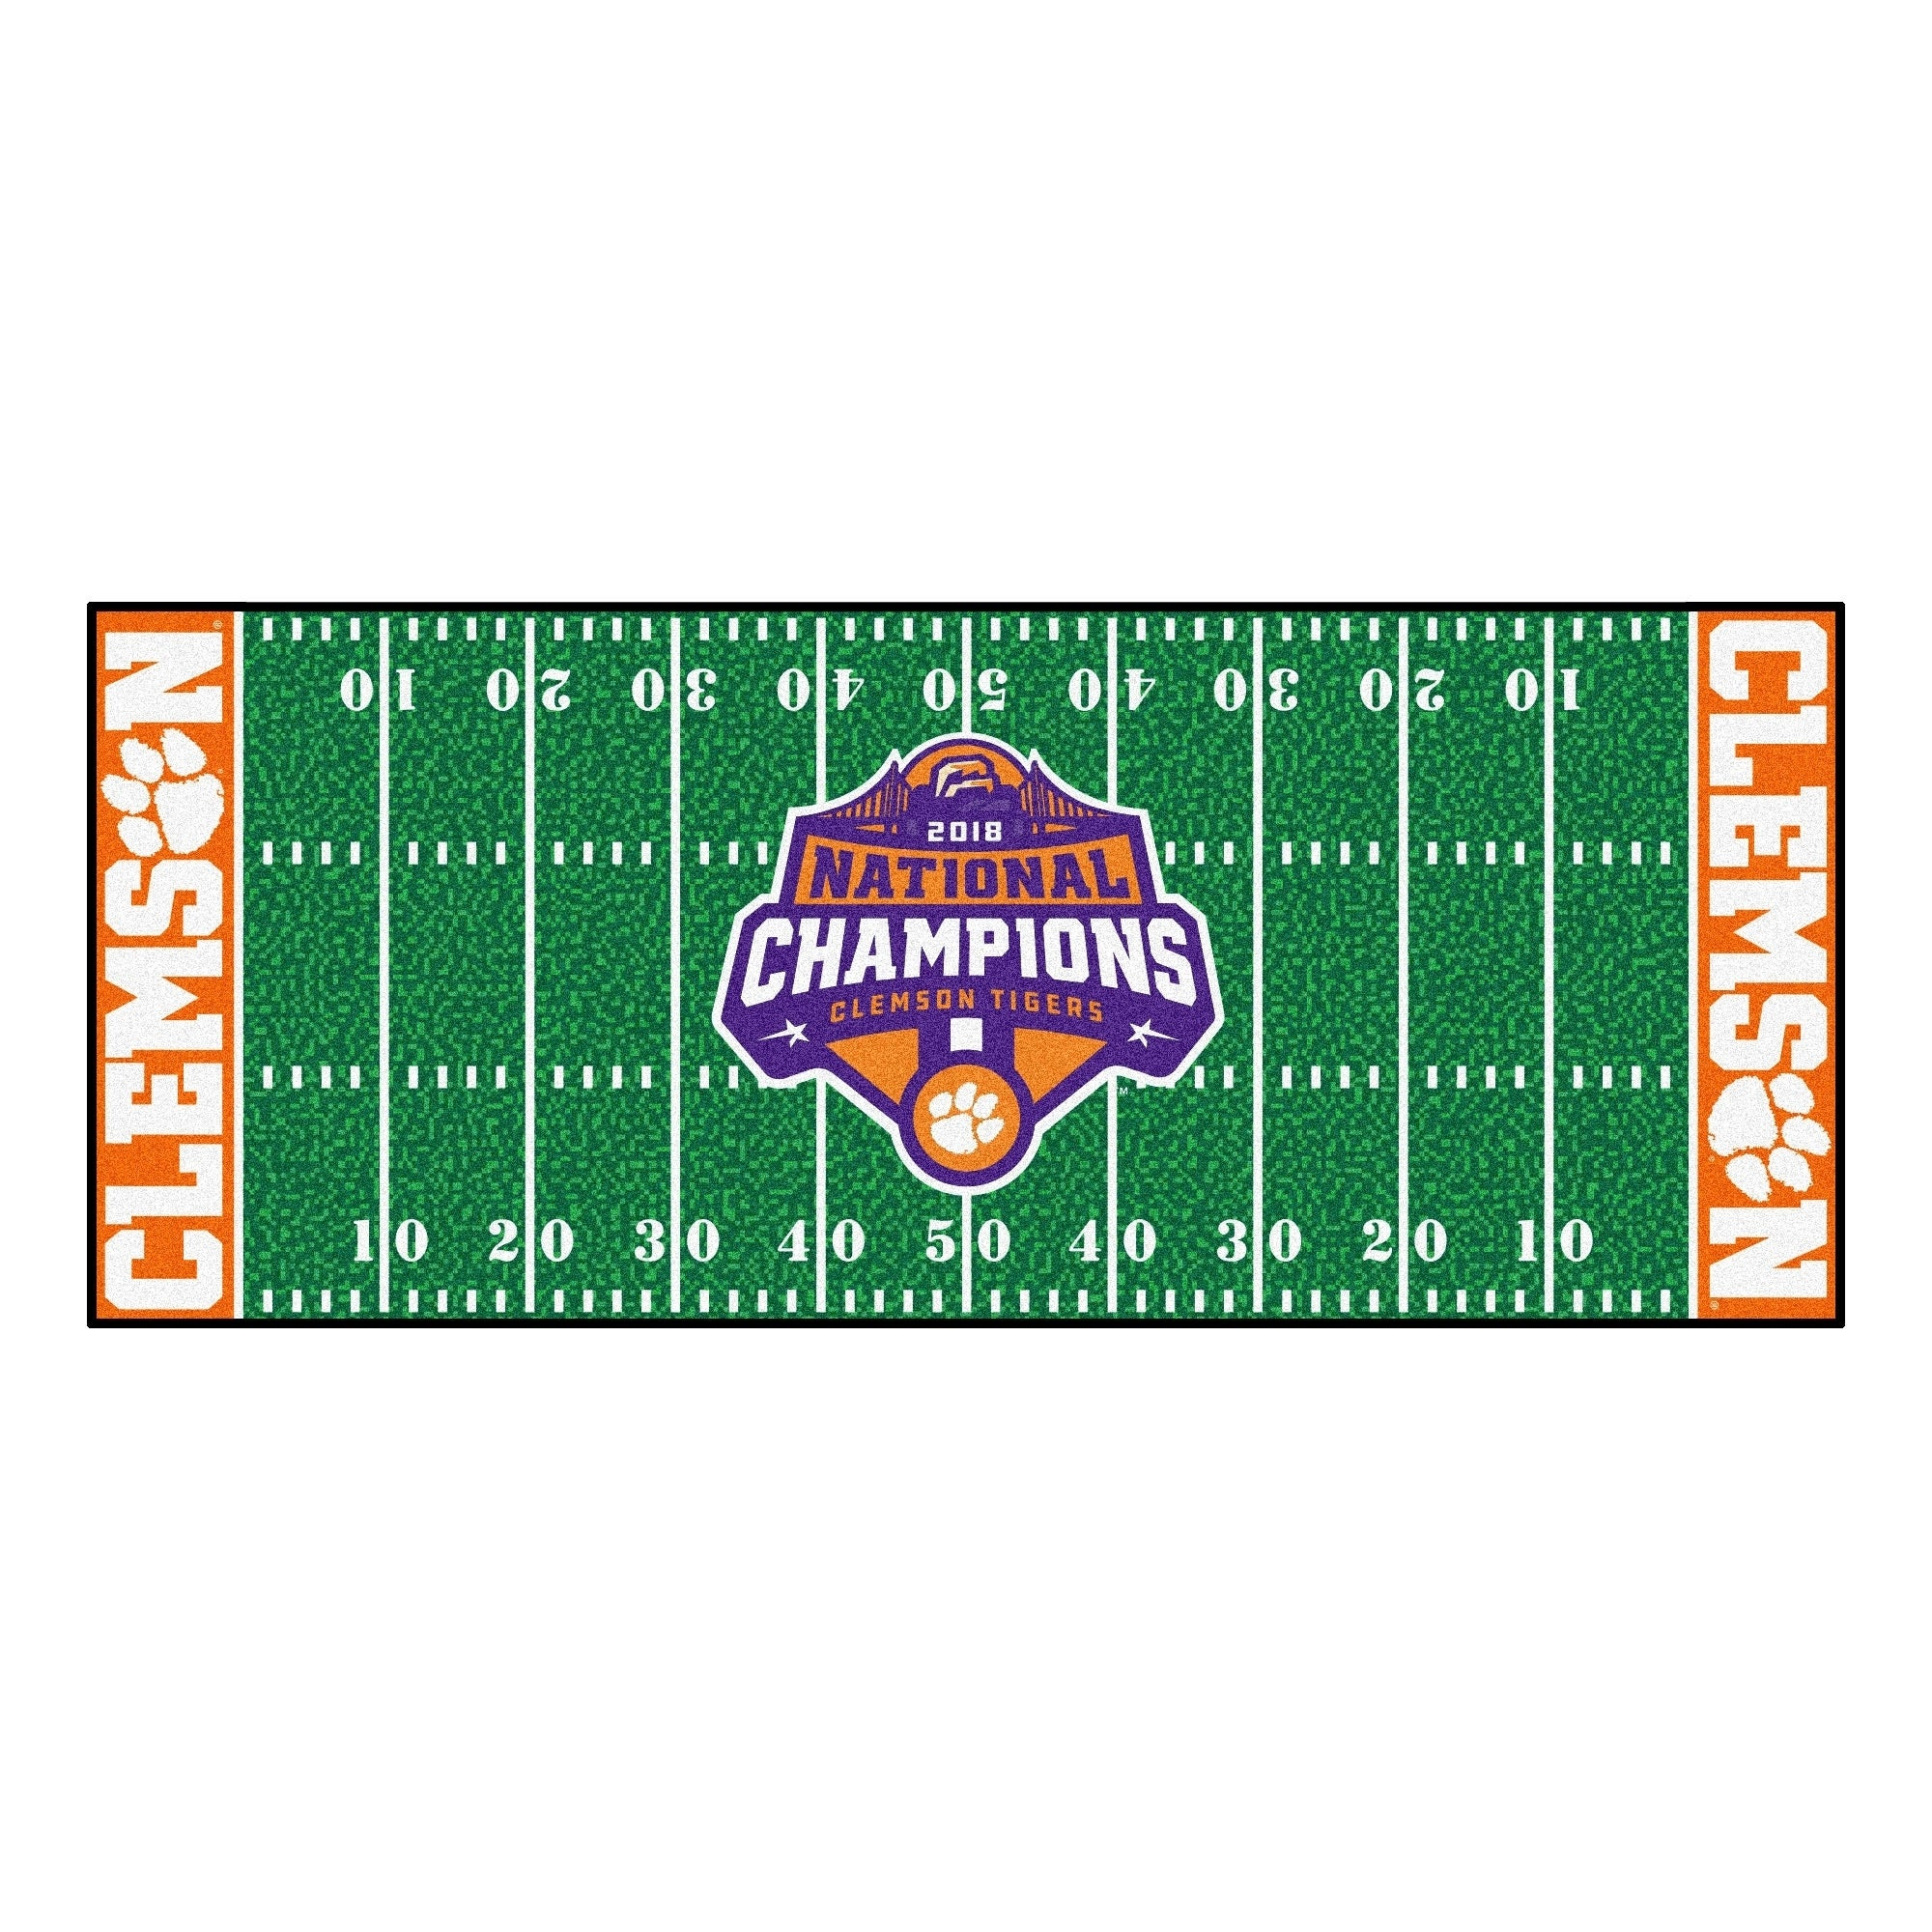 College Football Playoffs Champions